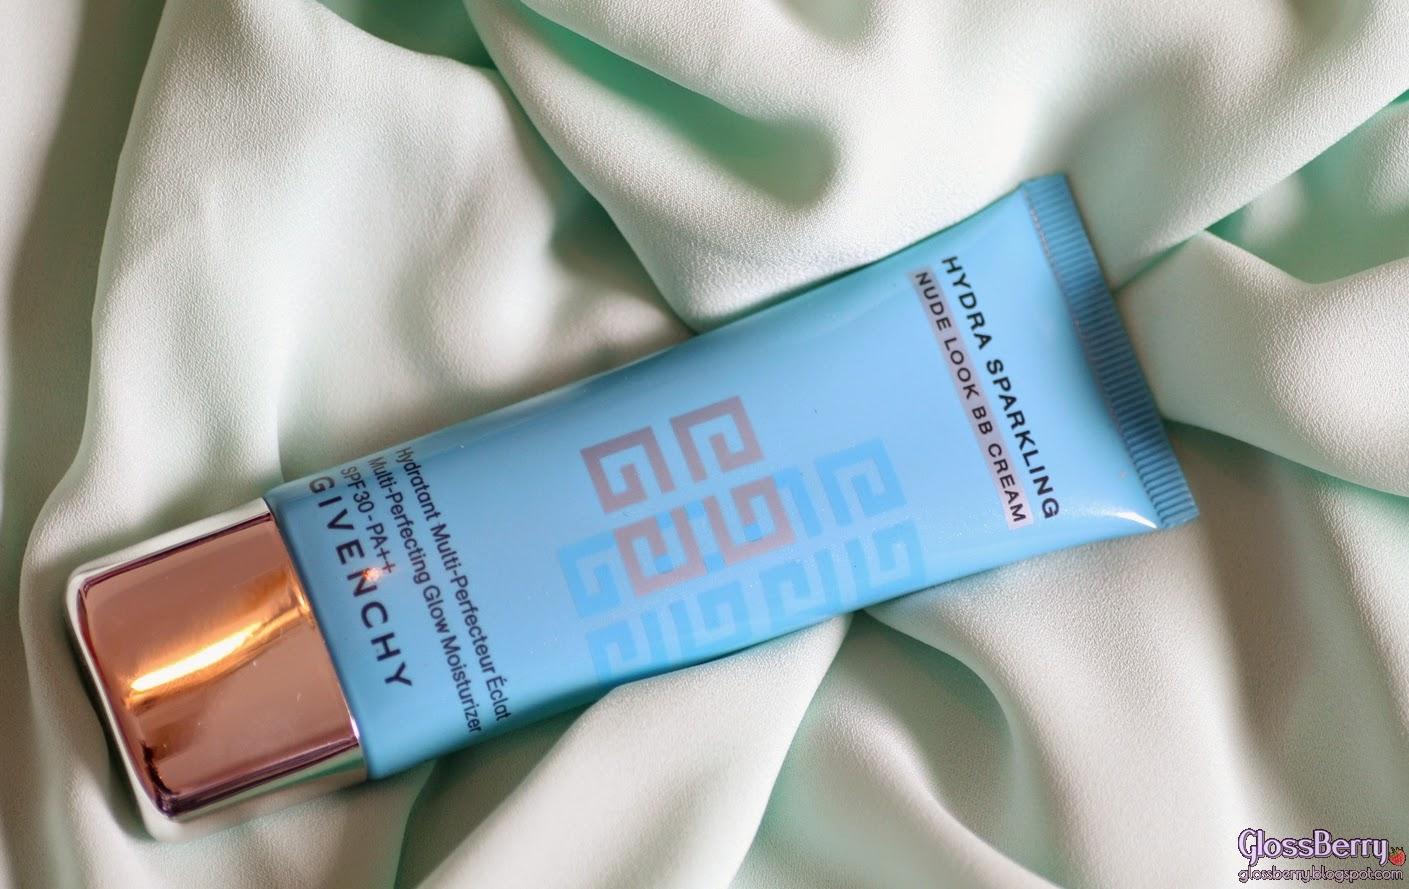 GIVENCHY Hydra Sparkling Nude Look BB Cream Multi-Perfecting Glow Moisturizer SPF 30 PA ++  סקירה ביבי BB קרם ג'יבנשי גלוסברי